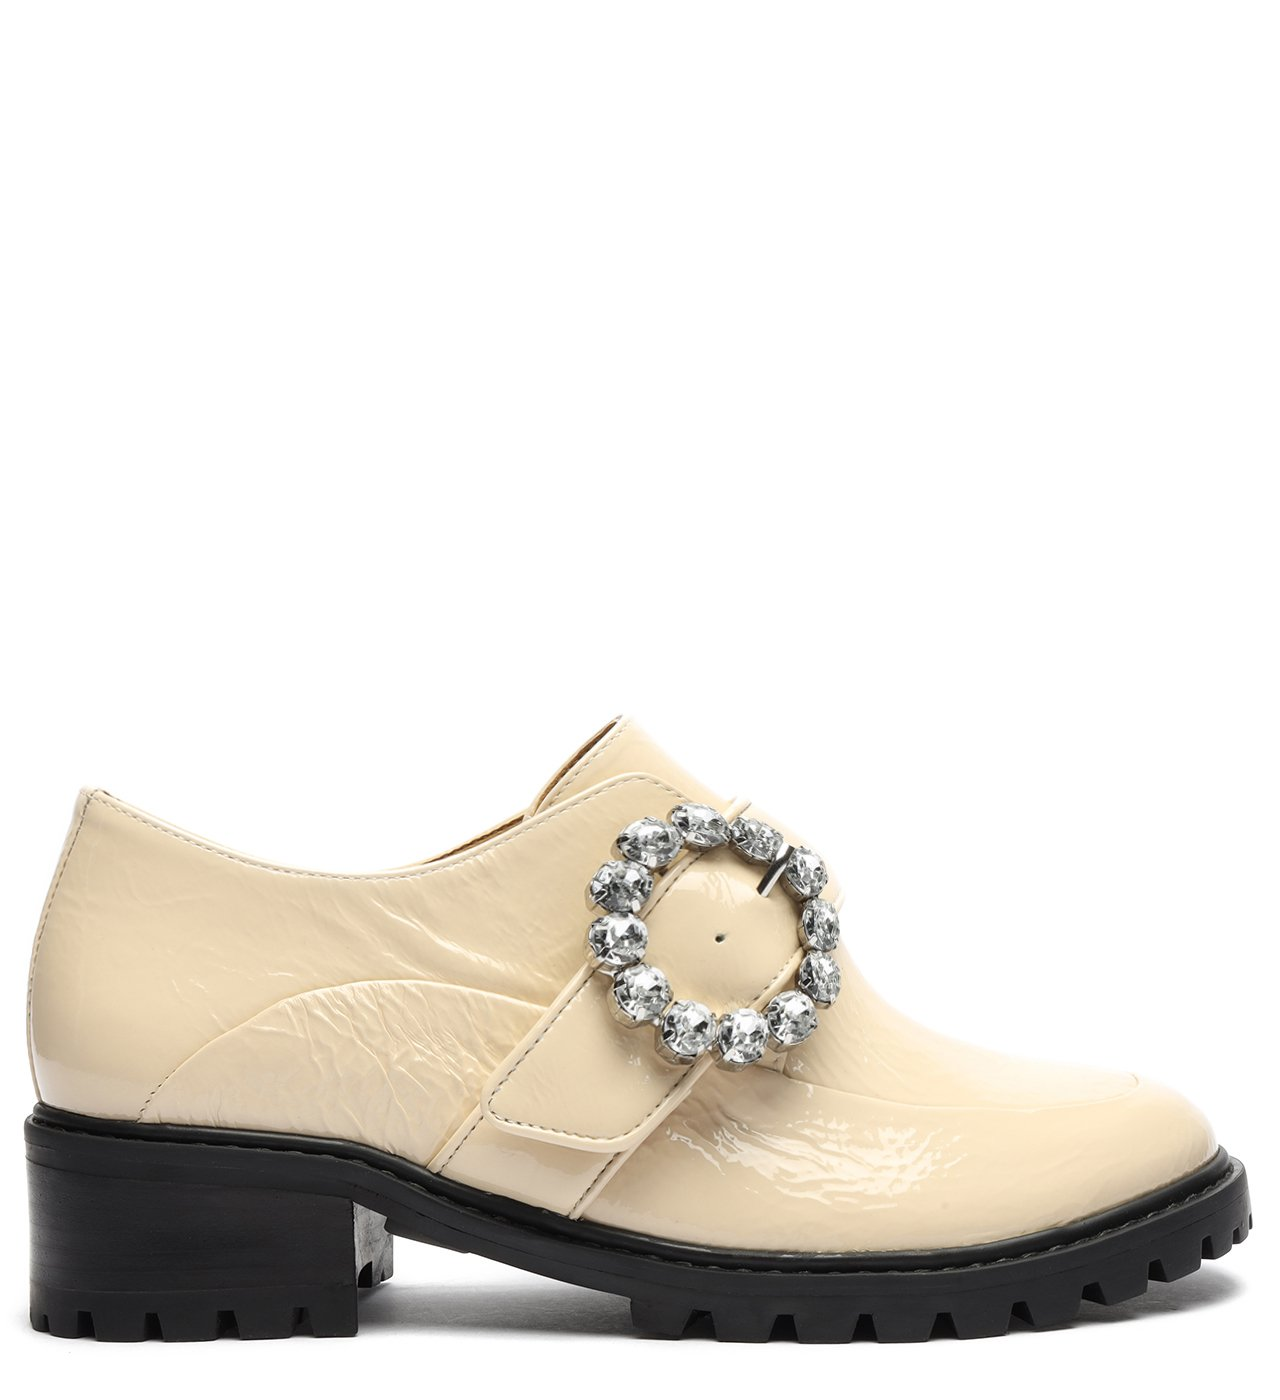 Sapato Oxford Tratorado Verniz Fivela Creme | Schutz